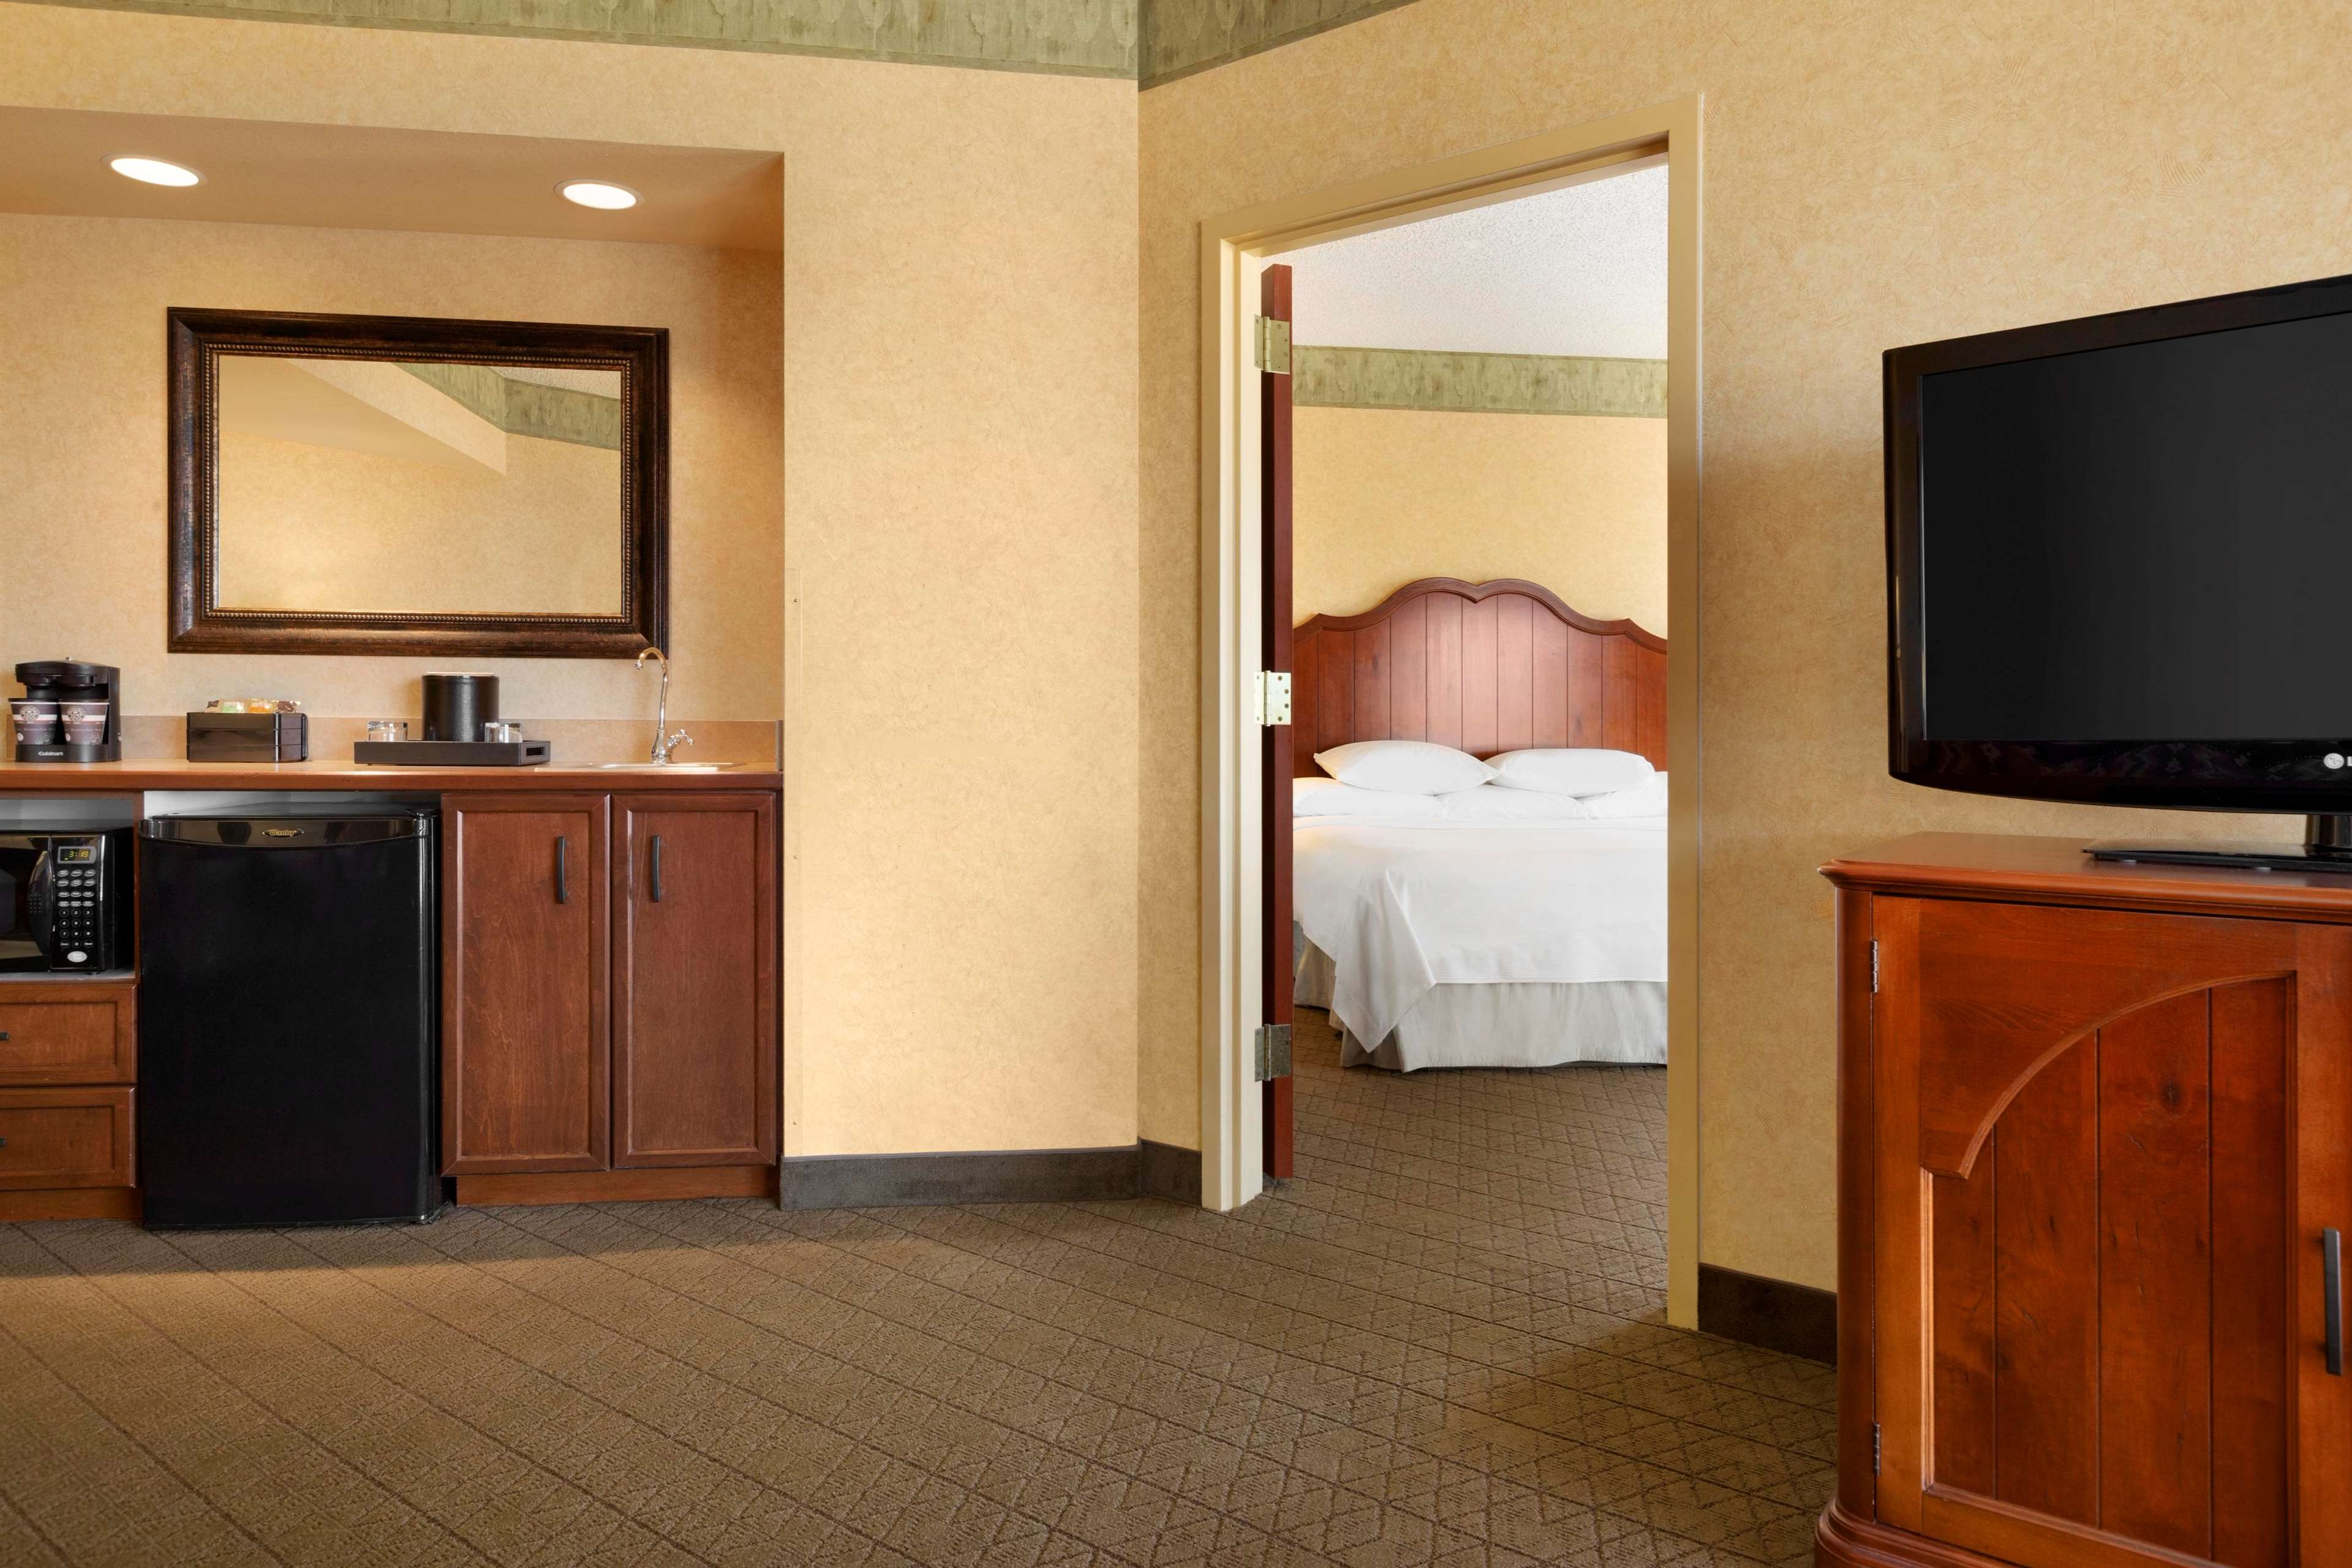 Embassy Suites by Hilton Albuquerque Hotel & Spa image 27